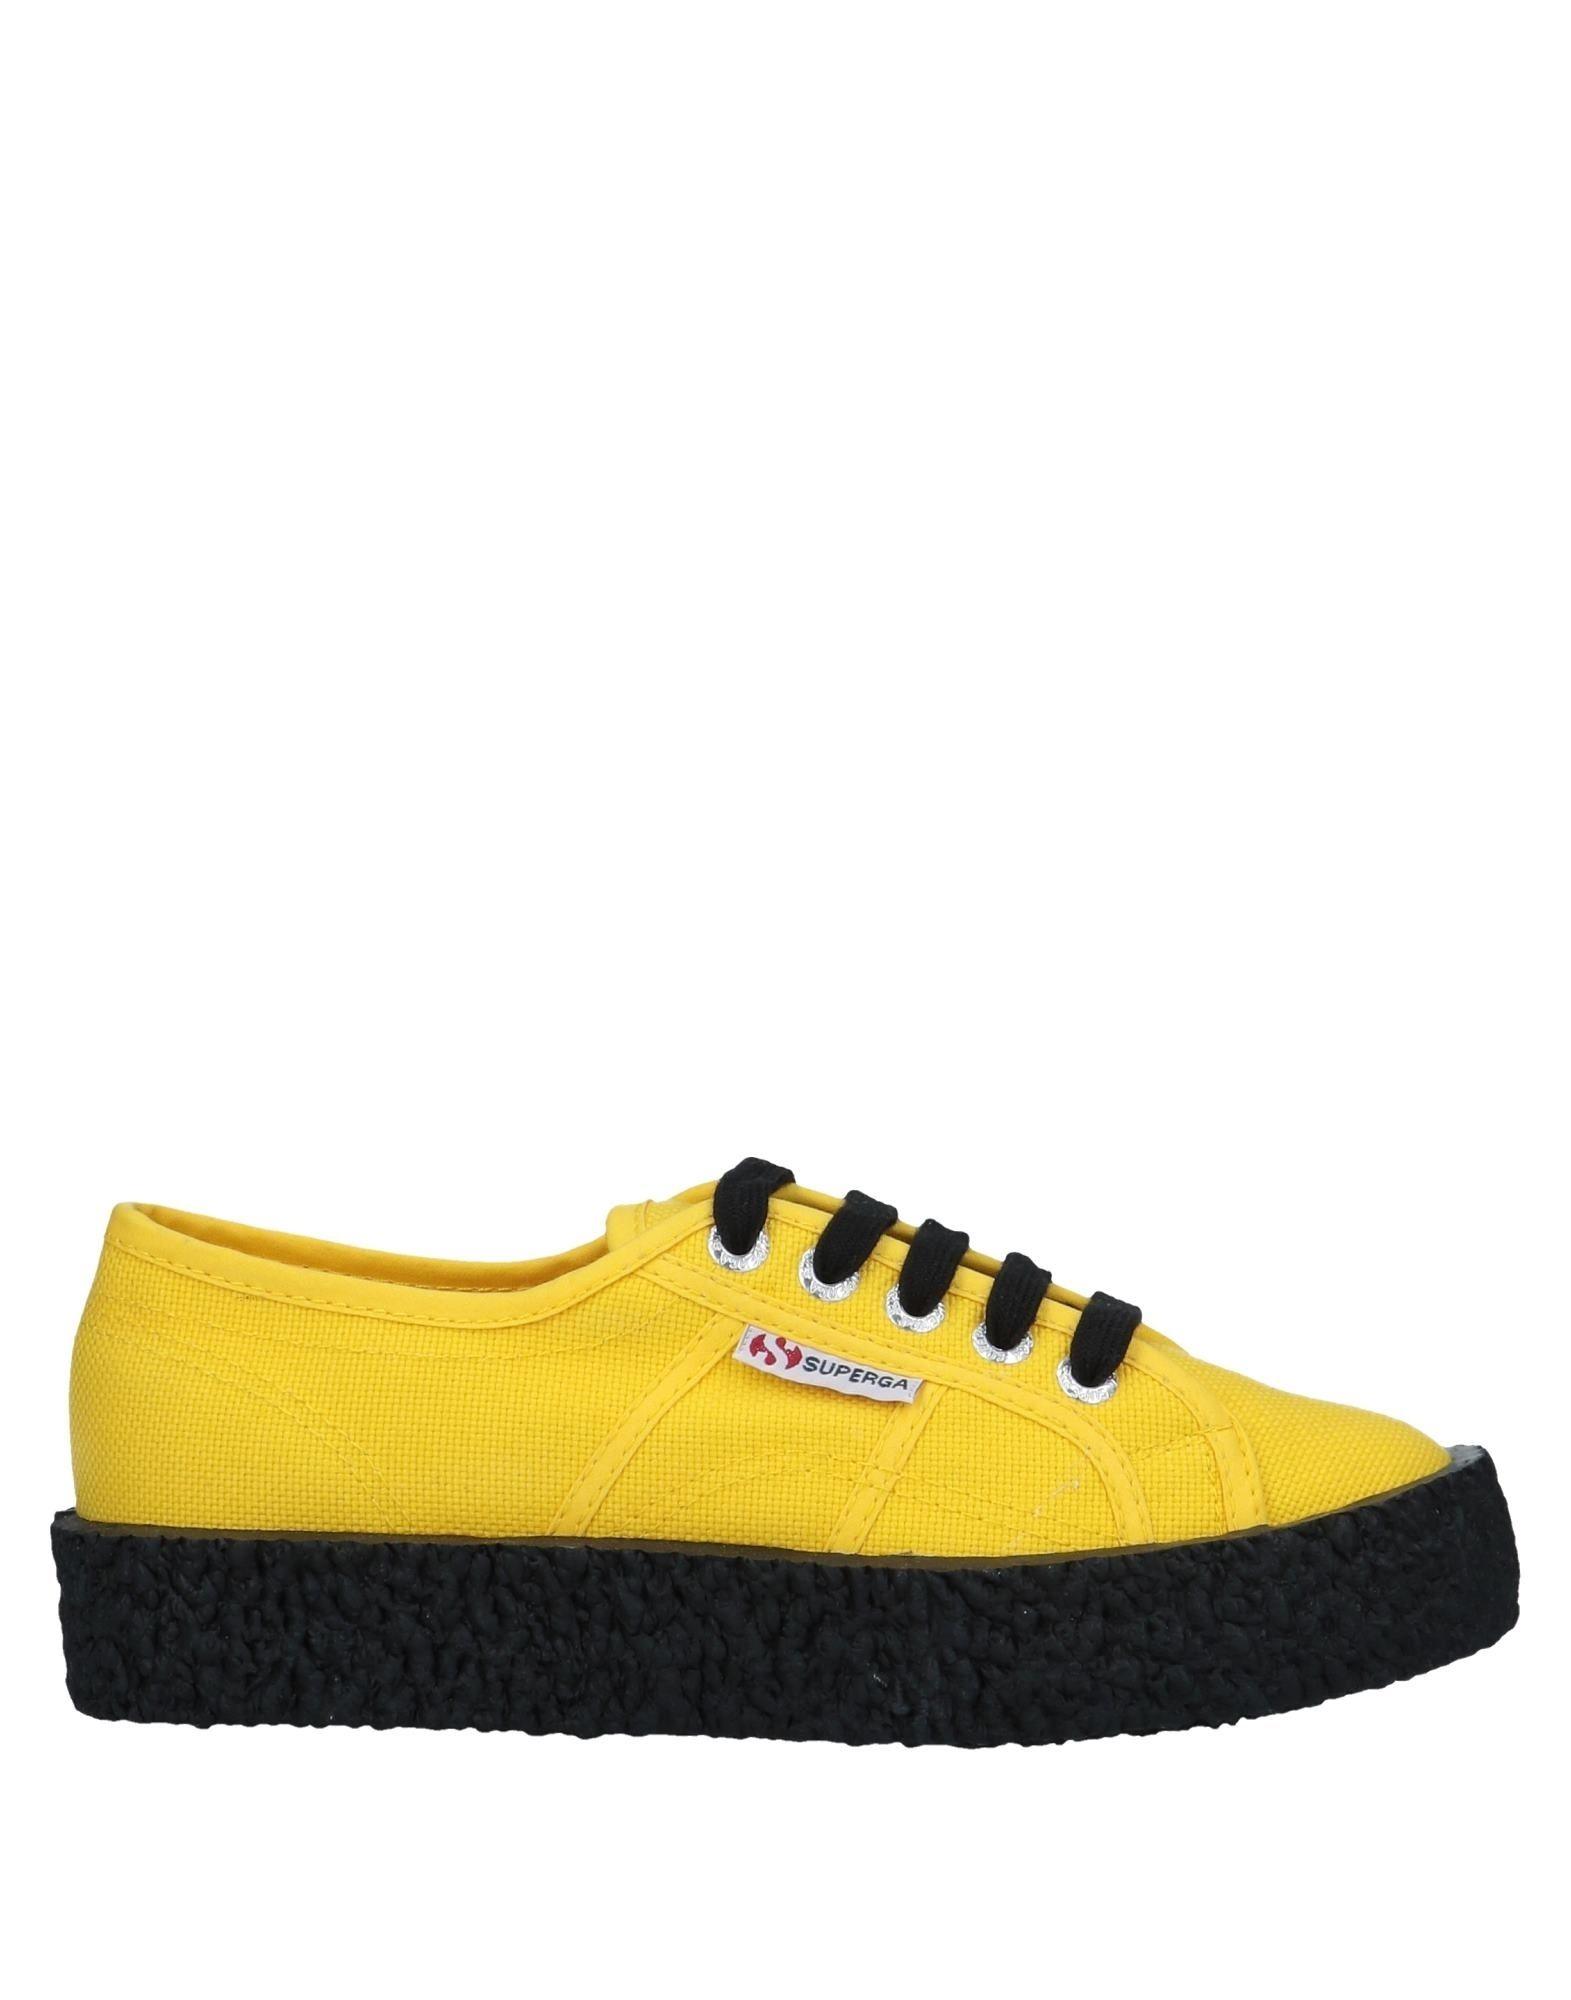 Superga® Sneakers - Women Superga® Sneakers online 11548241FI on  Canada - 11548241FI online a70e9a